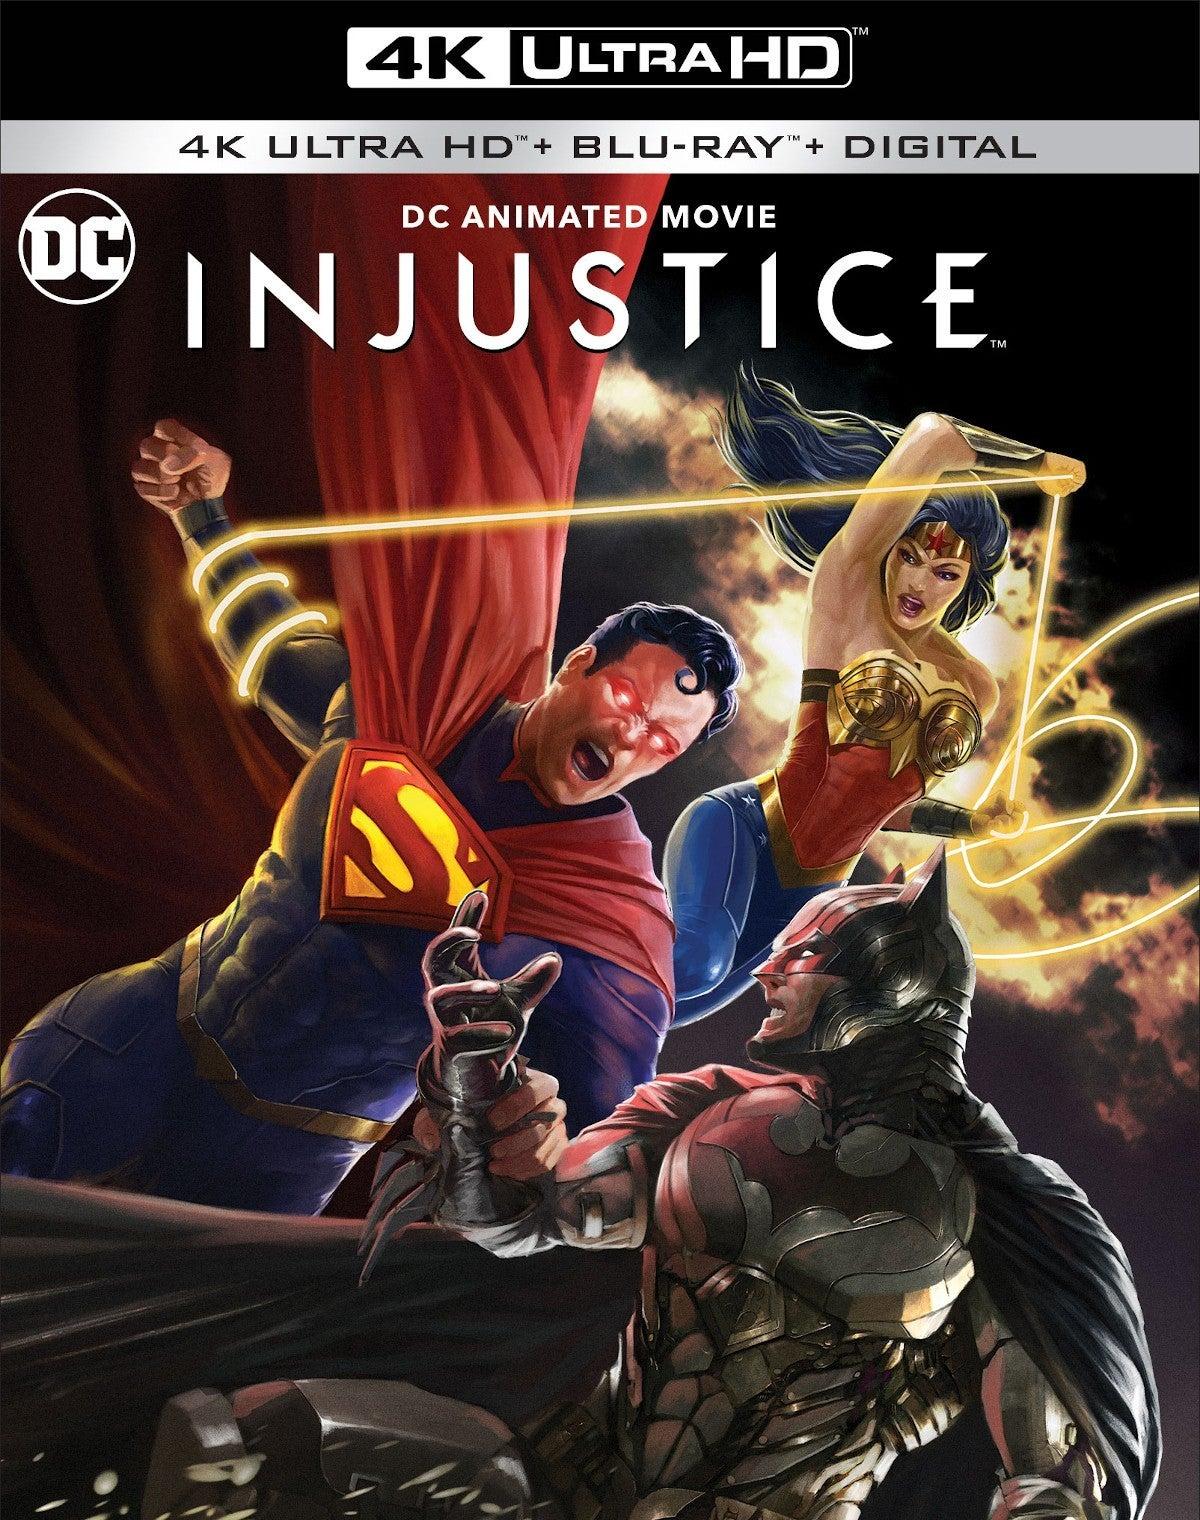 Injustice Movie Release Date 2021